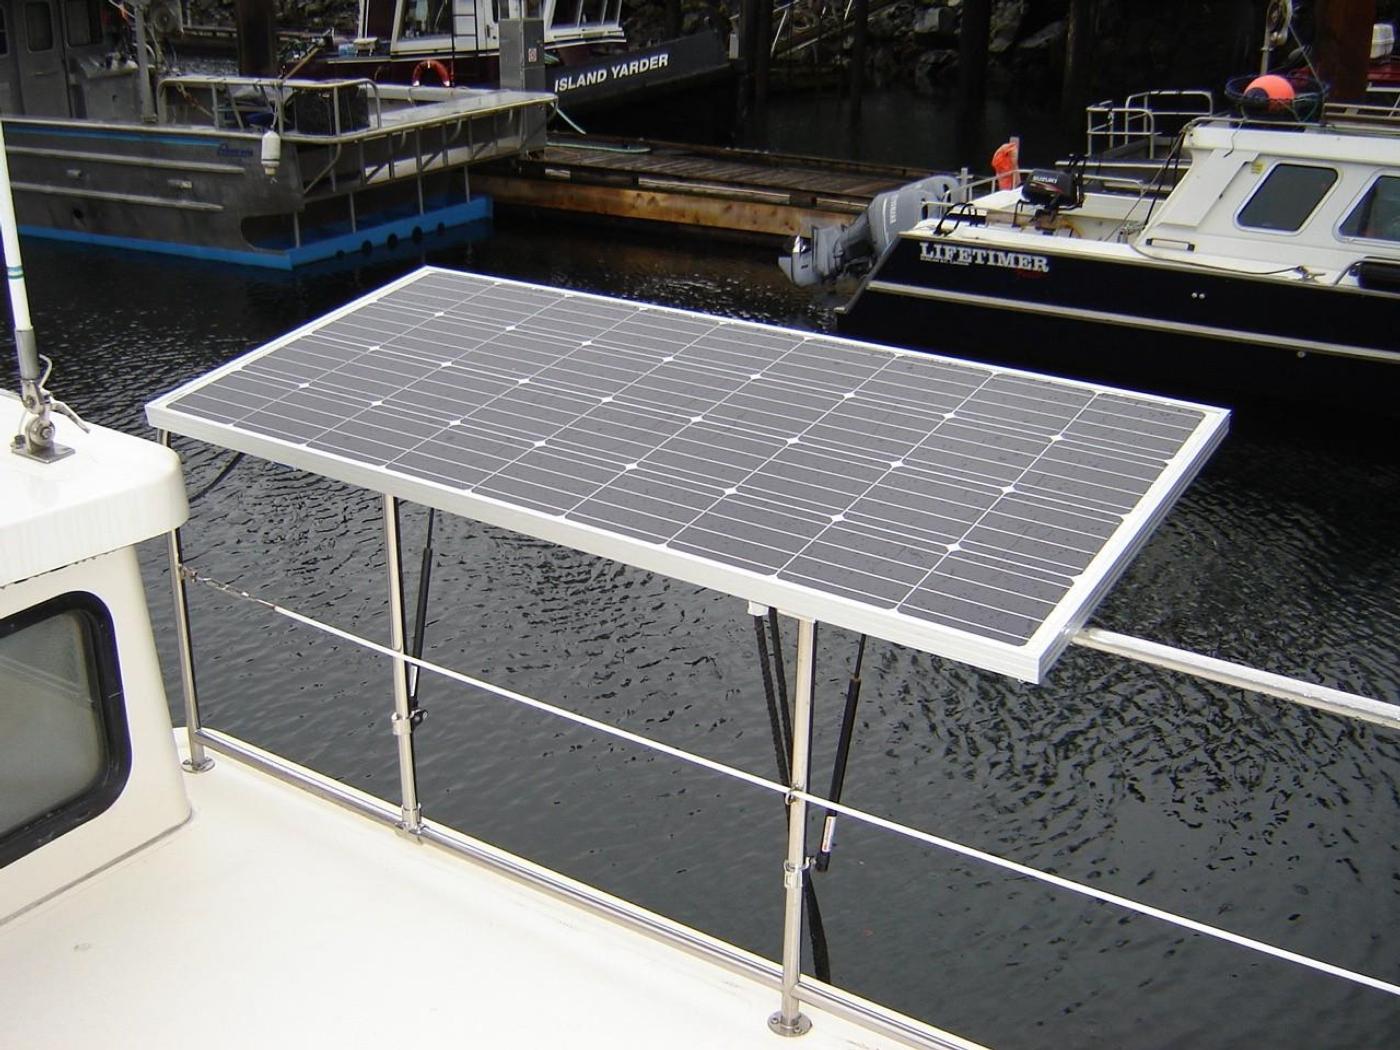 1999 Nordic Tugs 32, 1 of 2 Solar Panels Deployed